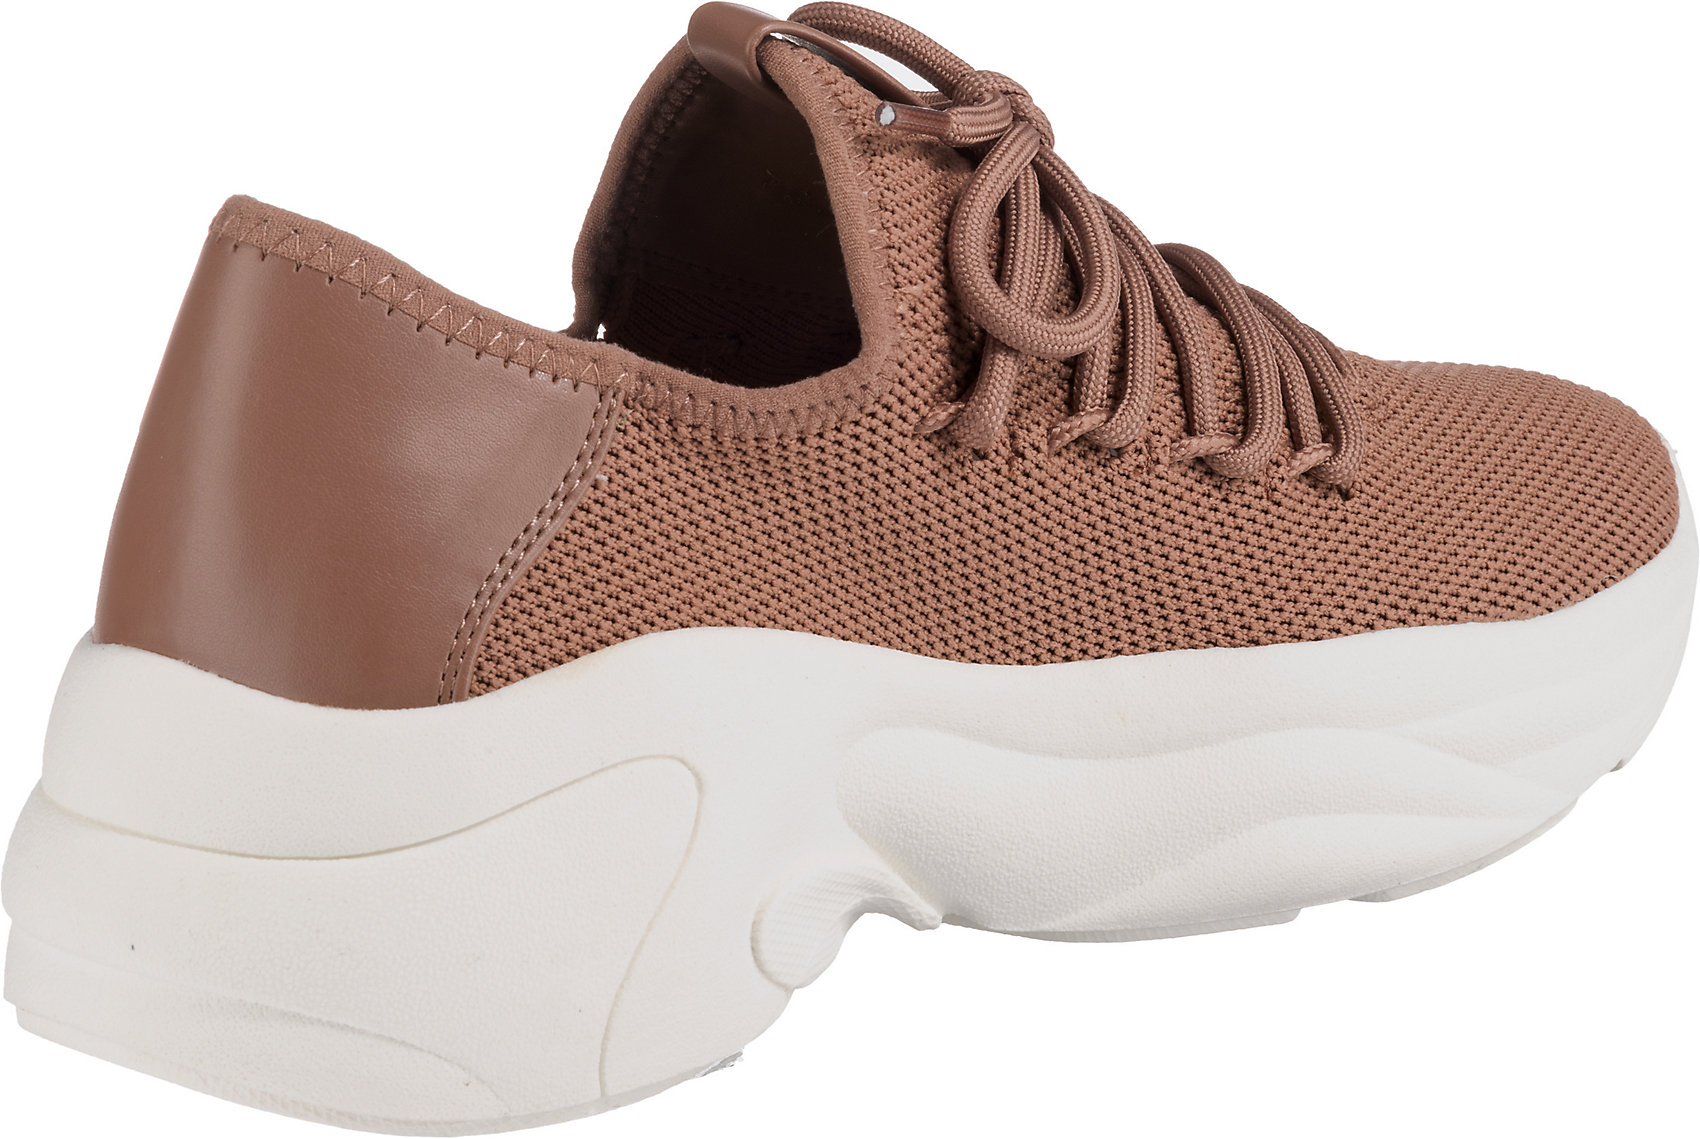 Neu STEVE MADDEN Sneakers Low 10131029 für Damen nude